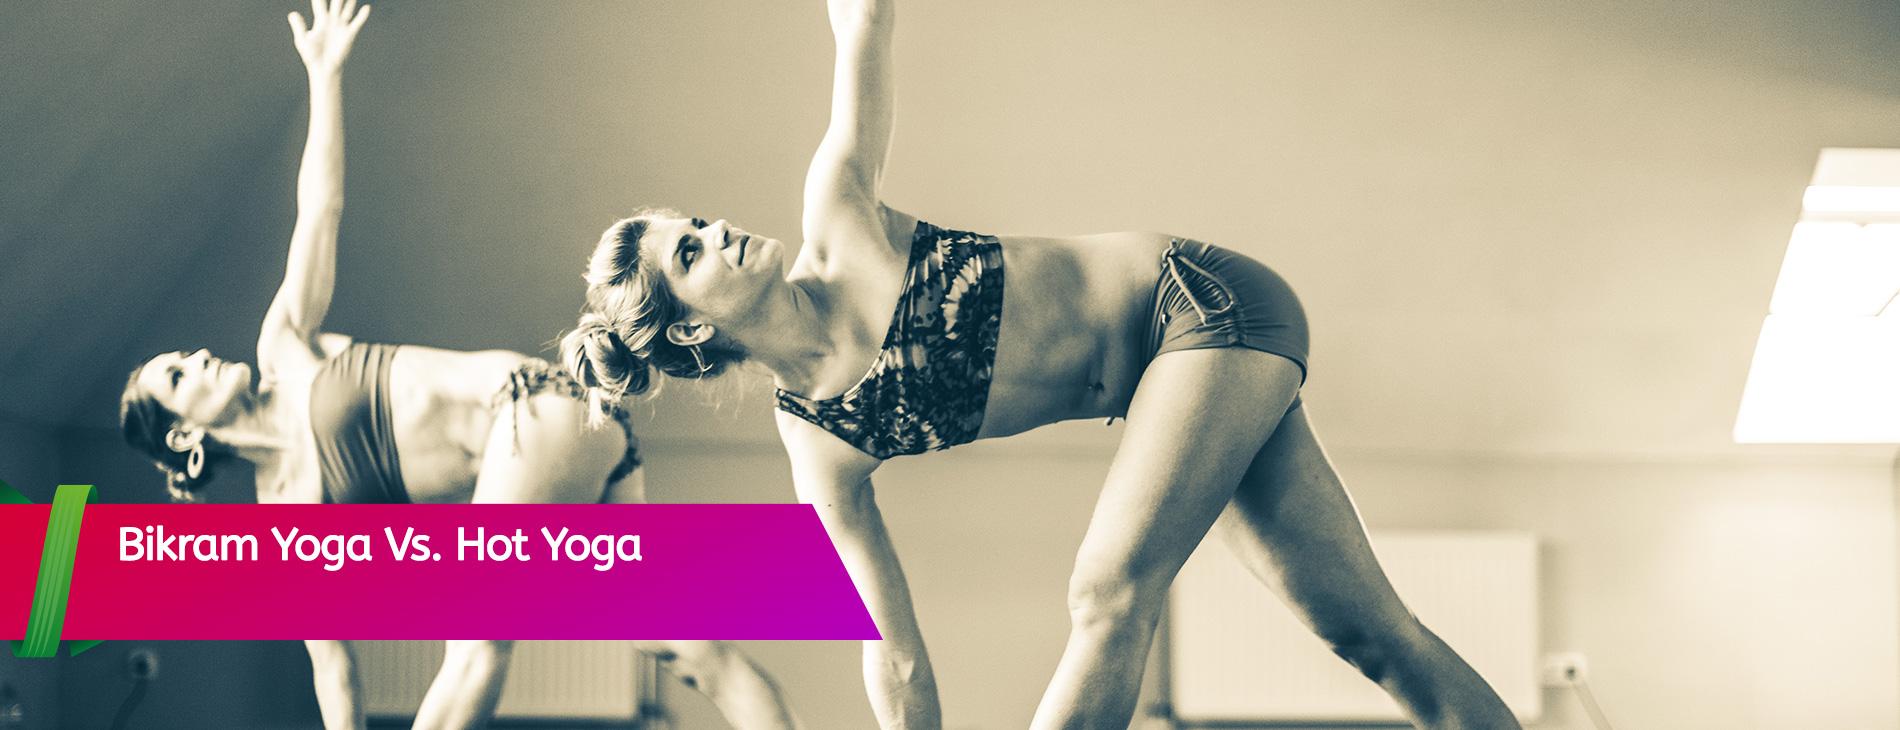 Bikram-Yoga-Vs.-Hot-Yoga